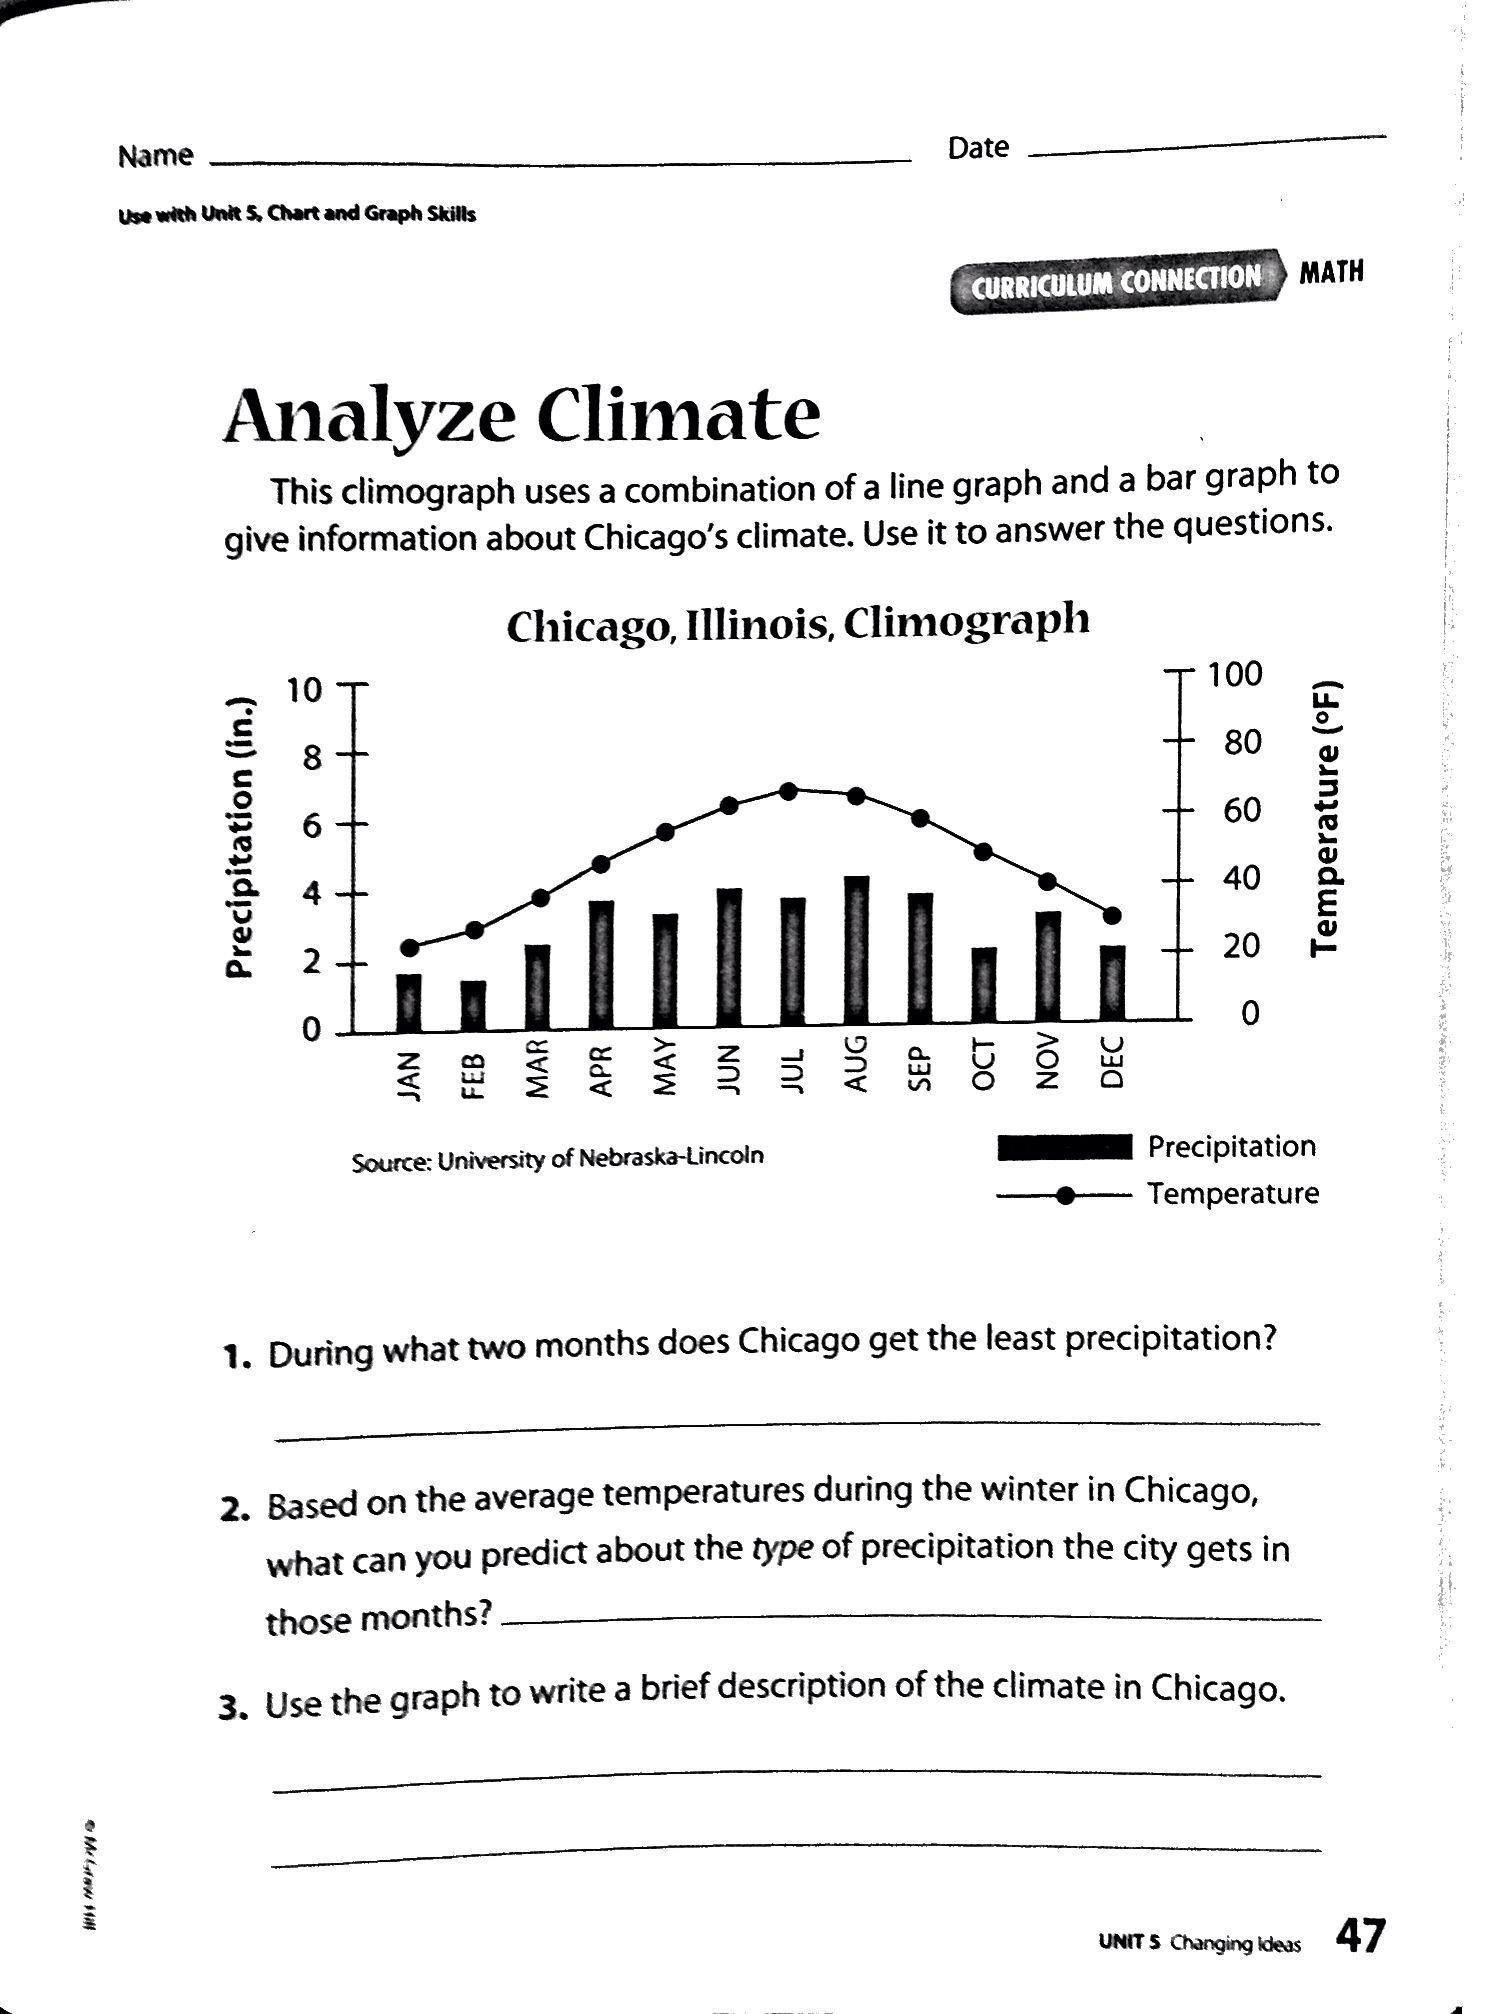 Iyze Climate